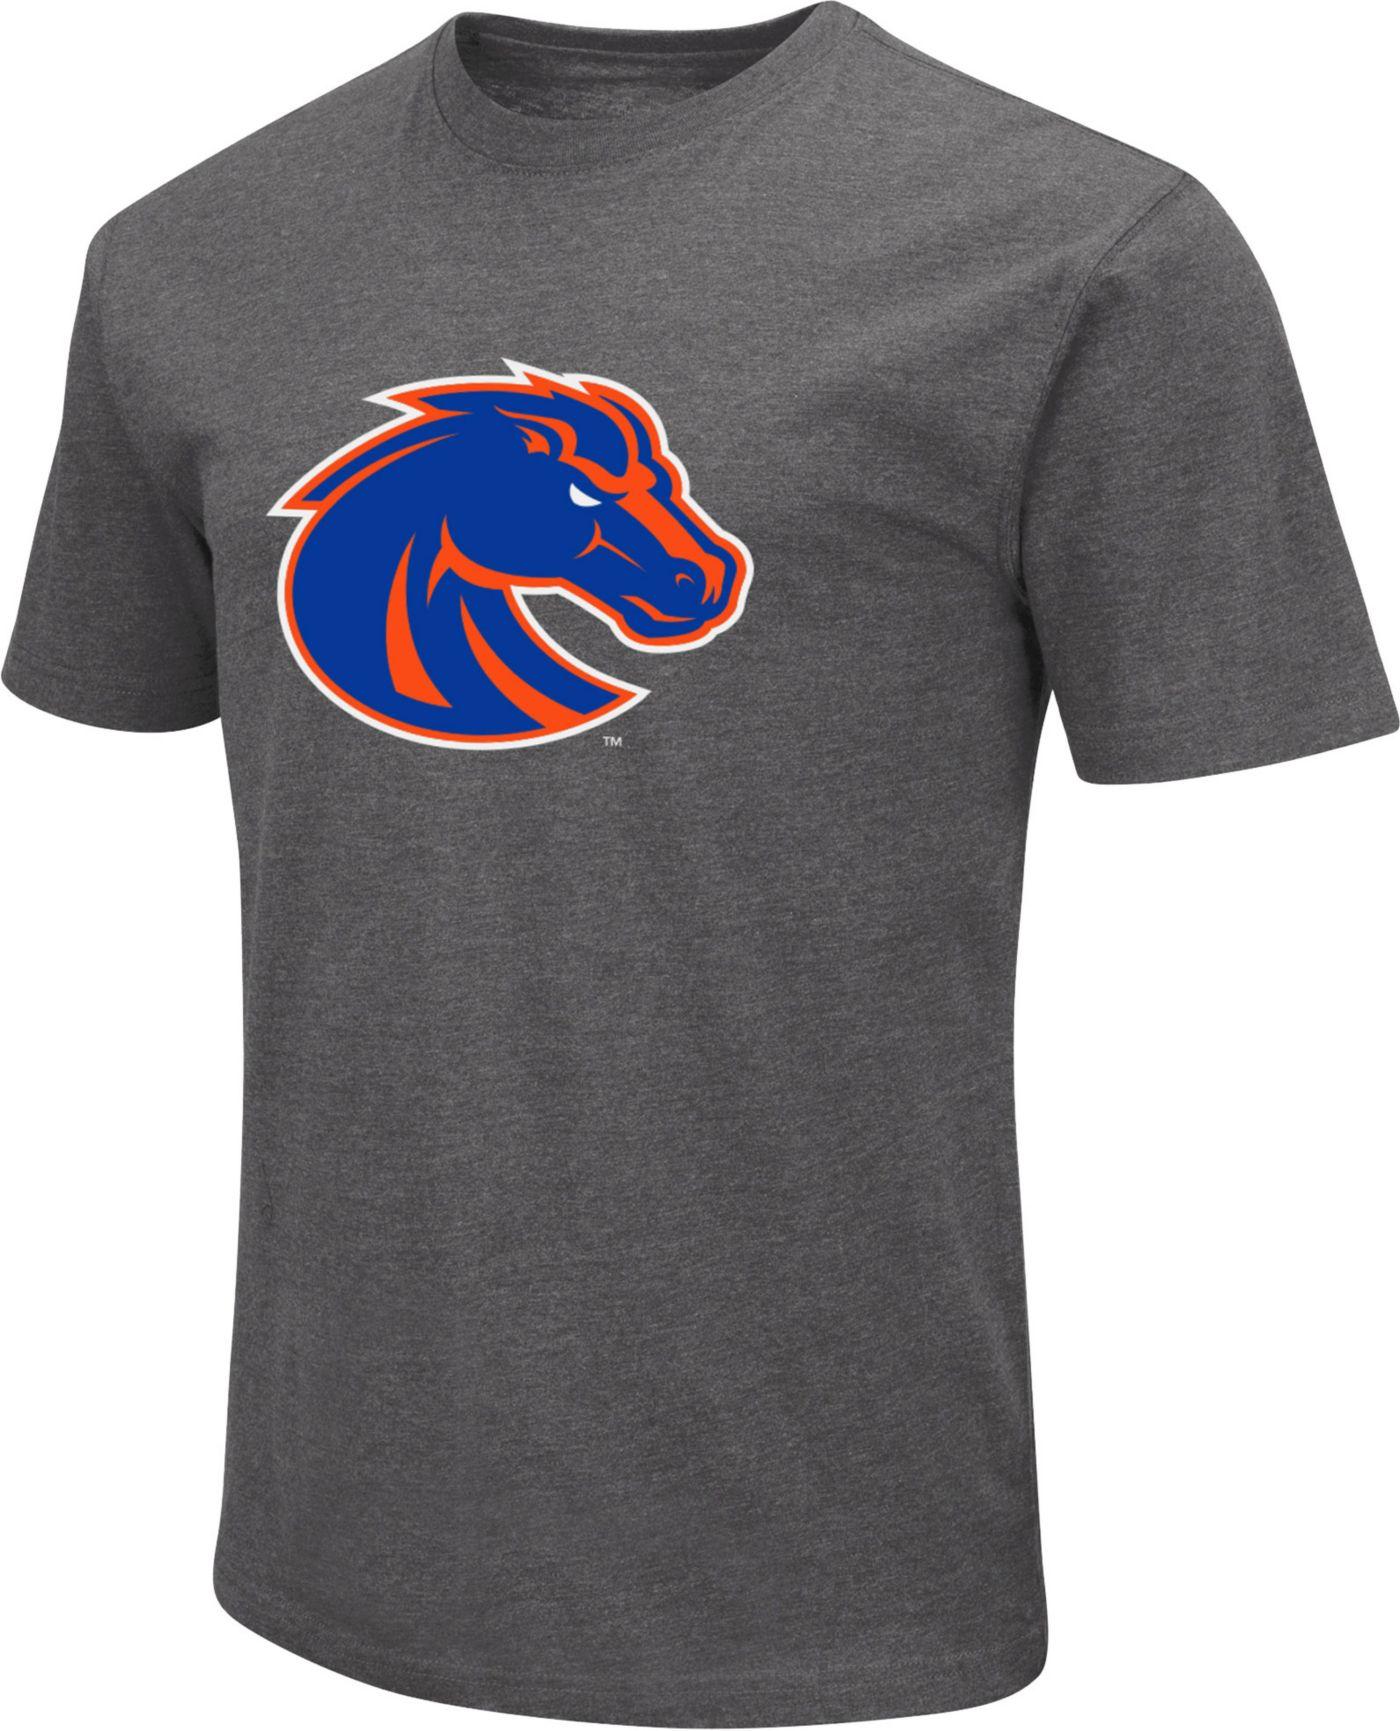 Colosseum Men's Boise State Broncos Grey Dual Blend T-Shirt